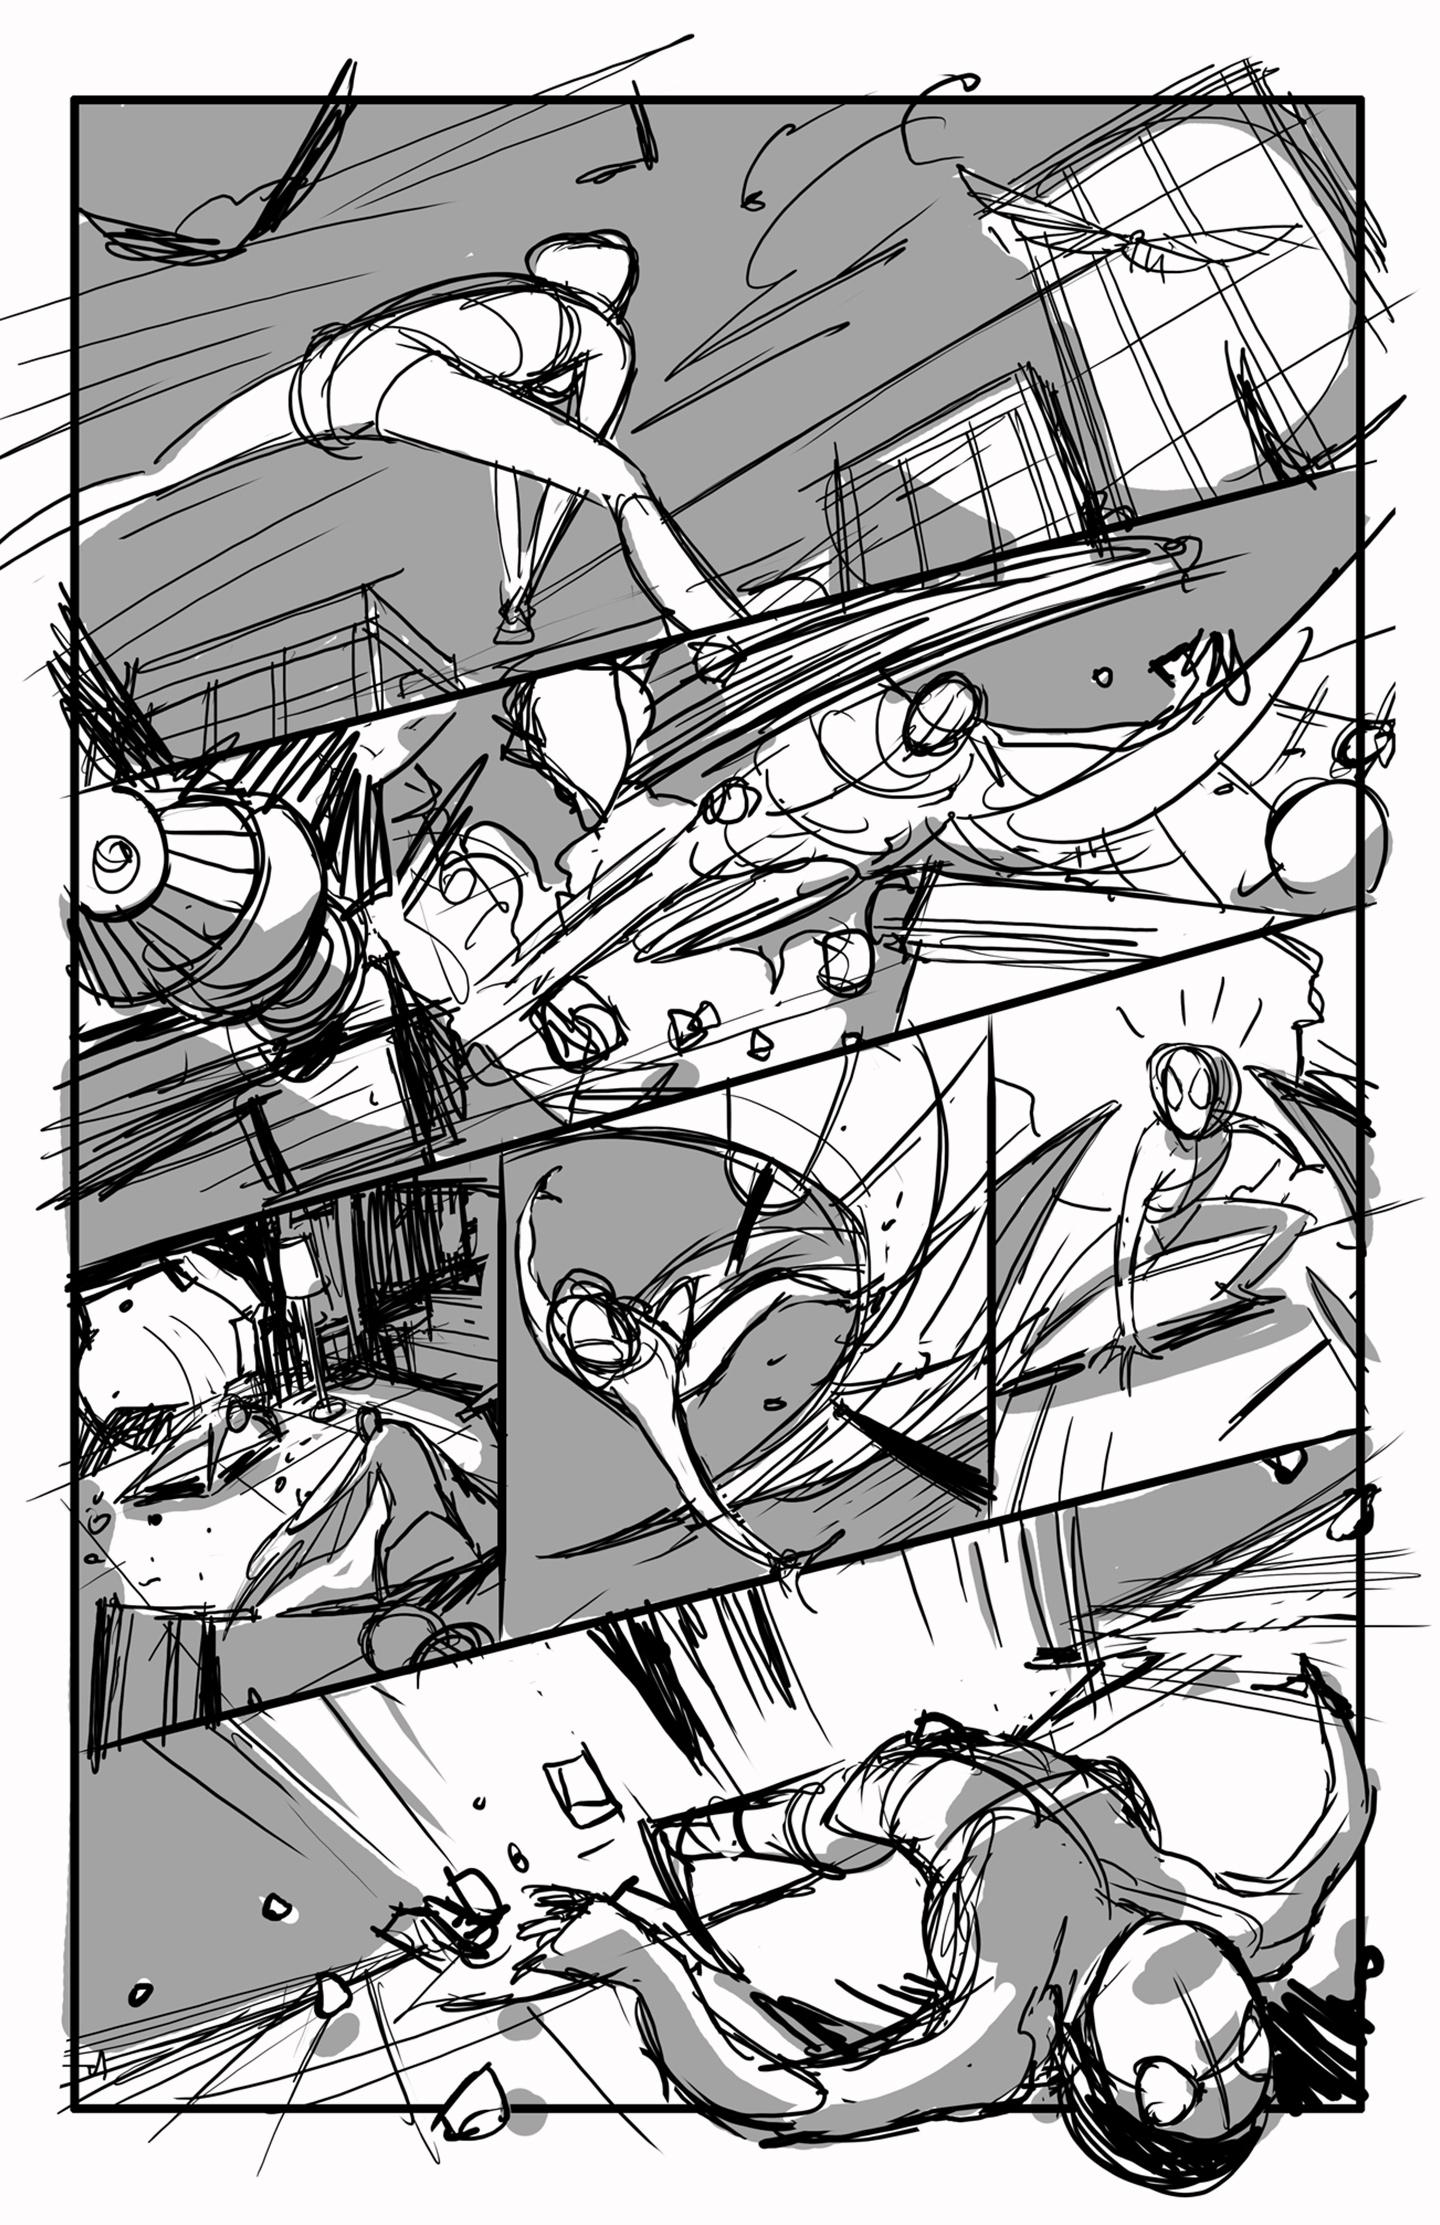 Spider-Gwen_Comics_Sequential_Roughs_03.jpg